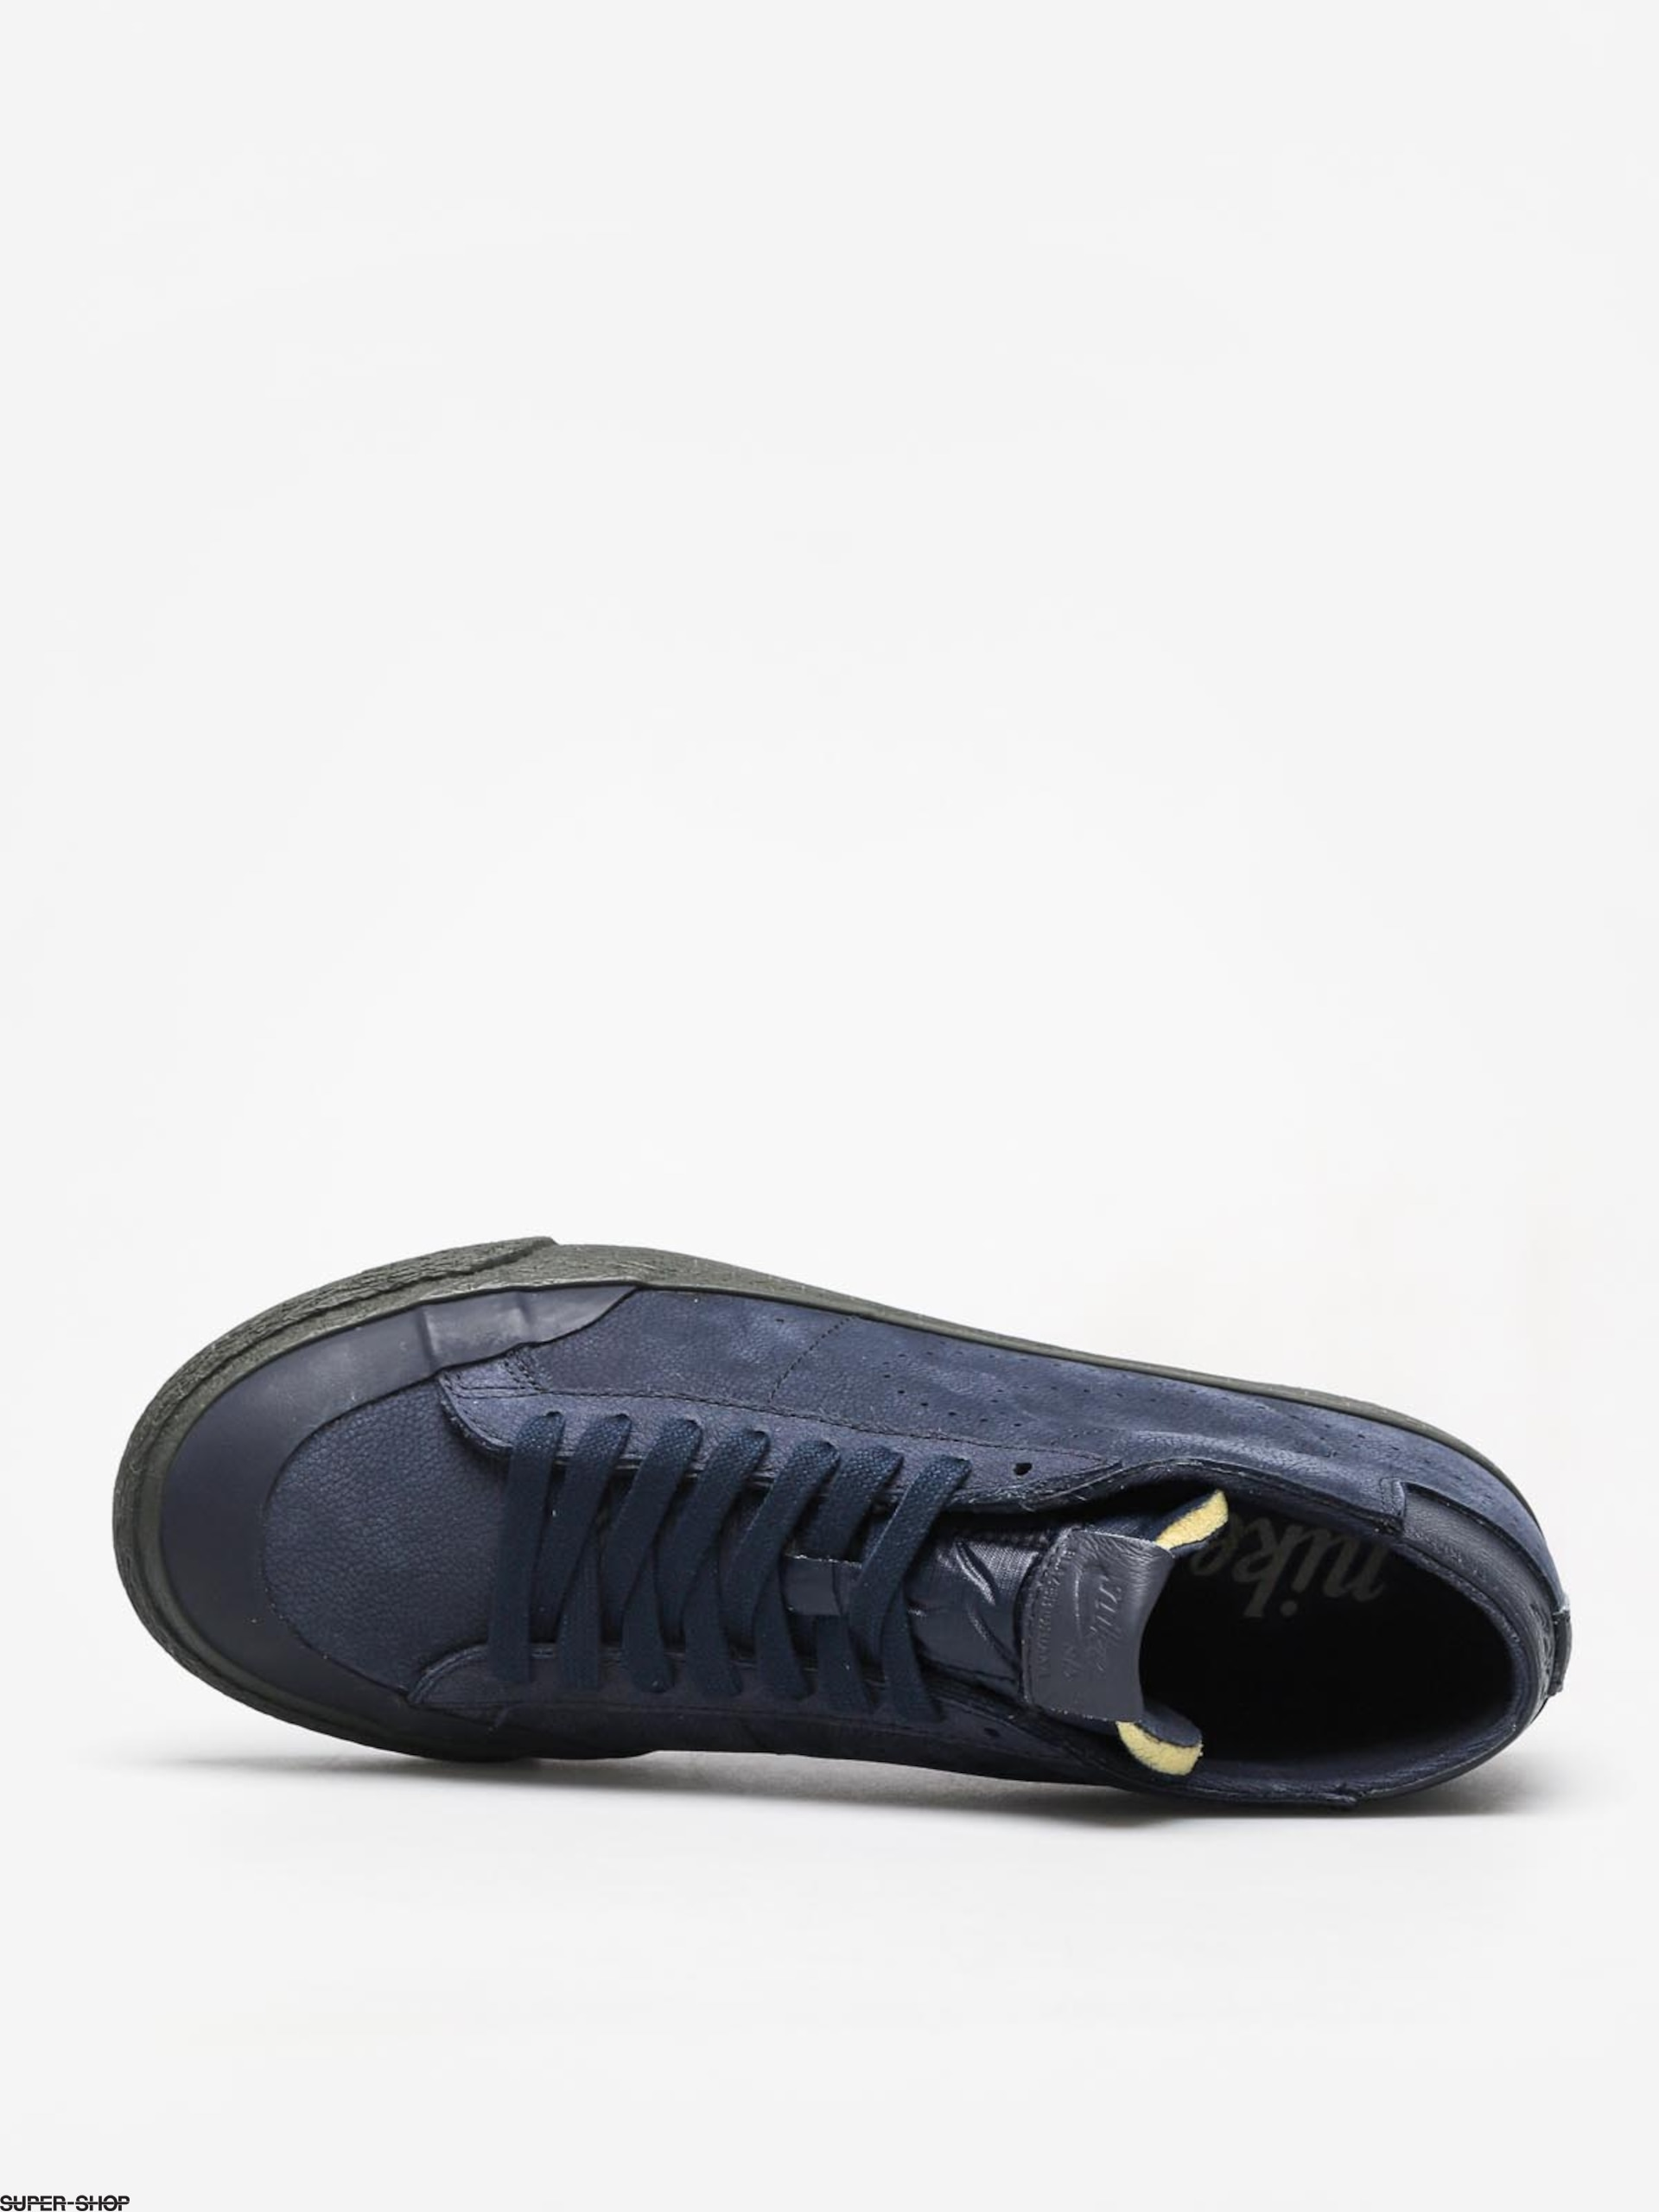 e2421dfa67b Nike SB Sb Zoom Blazer Chukka Xt Premium Shoes (obsidian obsidian)